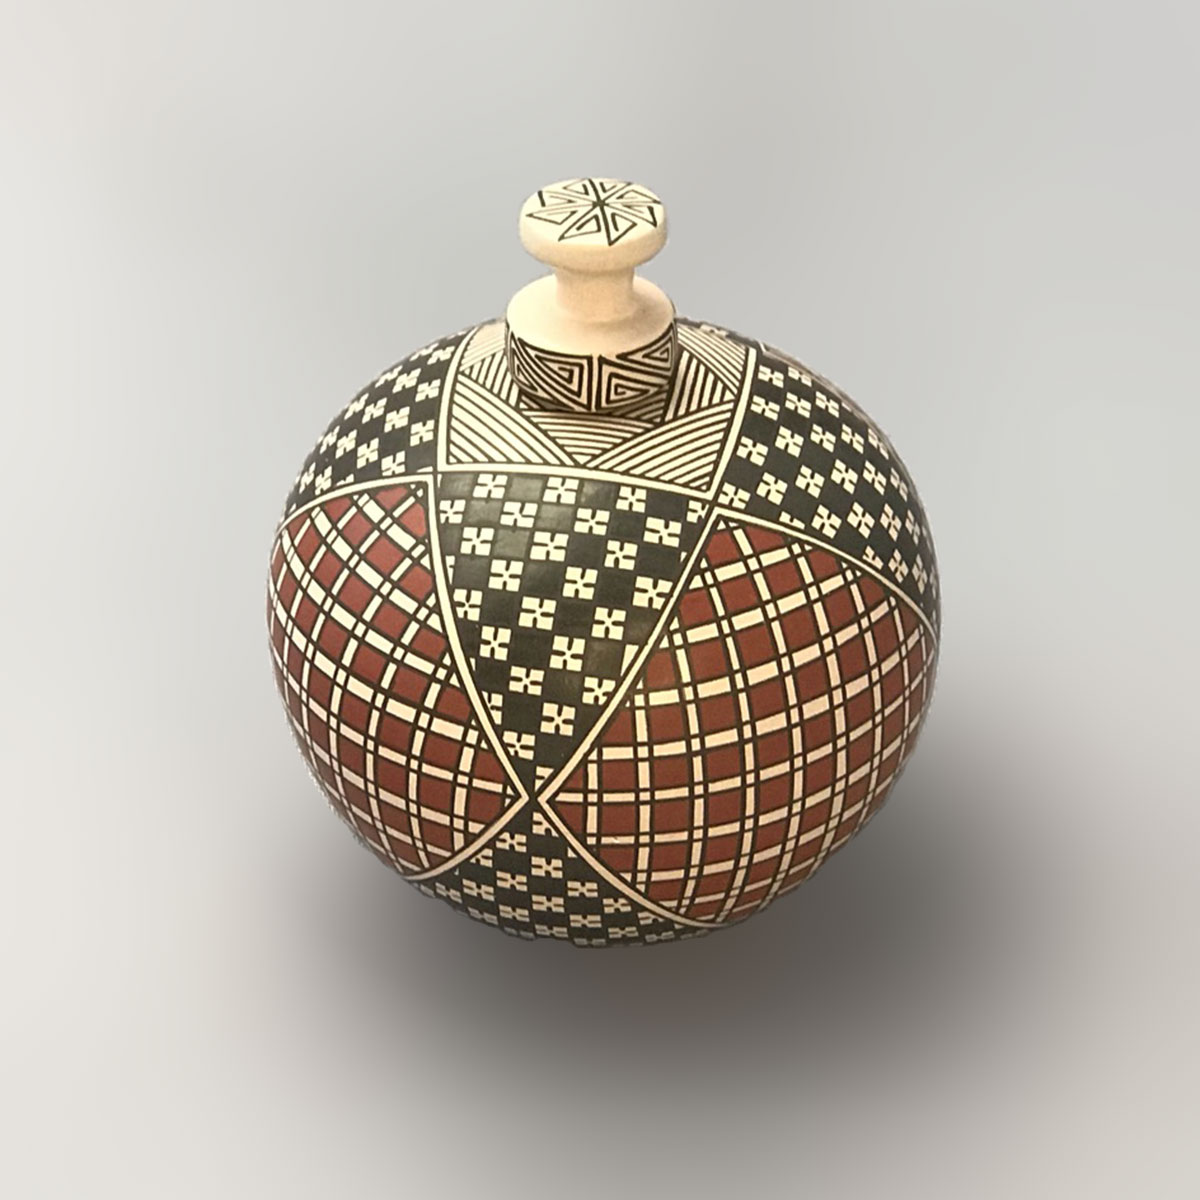 Blanca Quezada Blanca Quezada: Small Geometric Lidded Pot Geometric